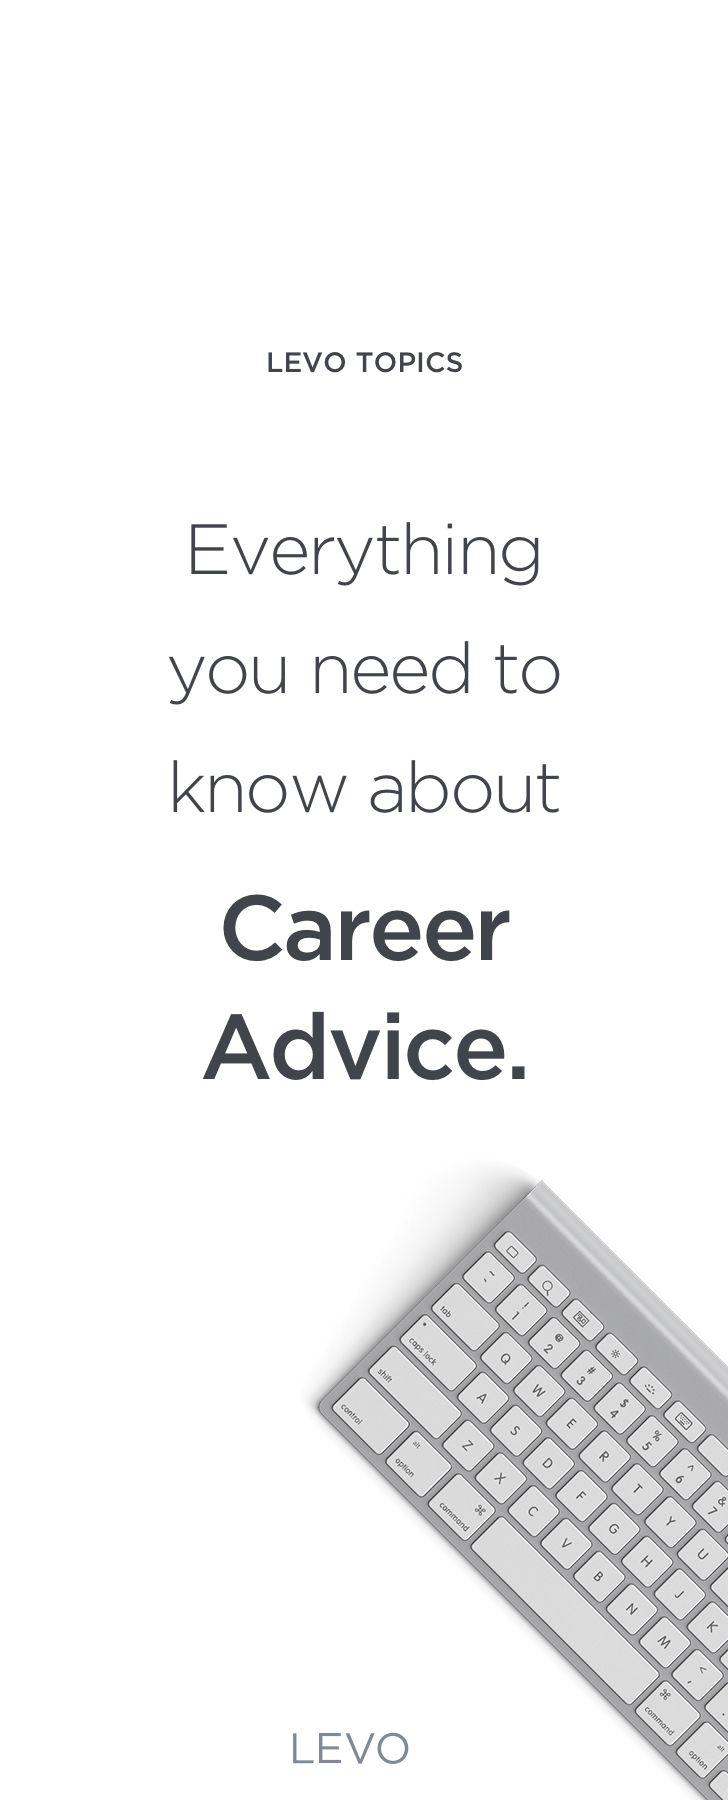 #careeradvice